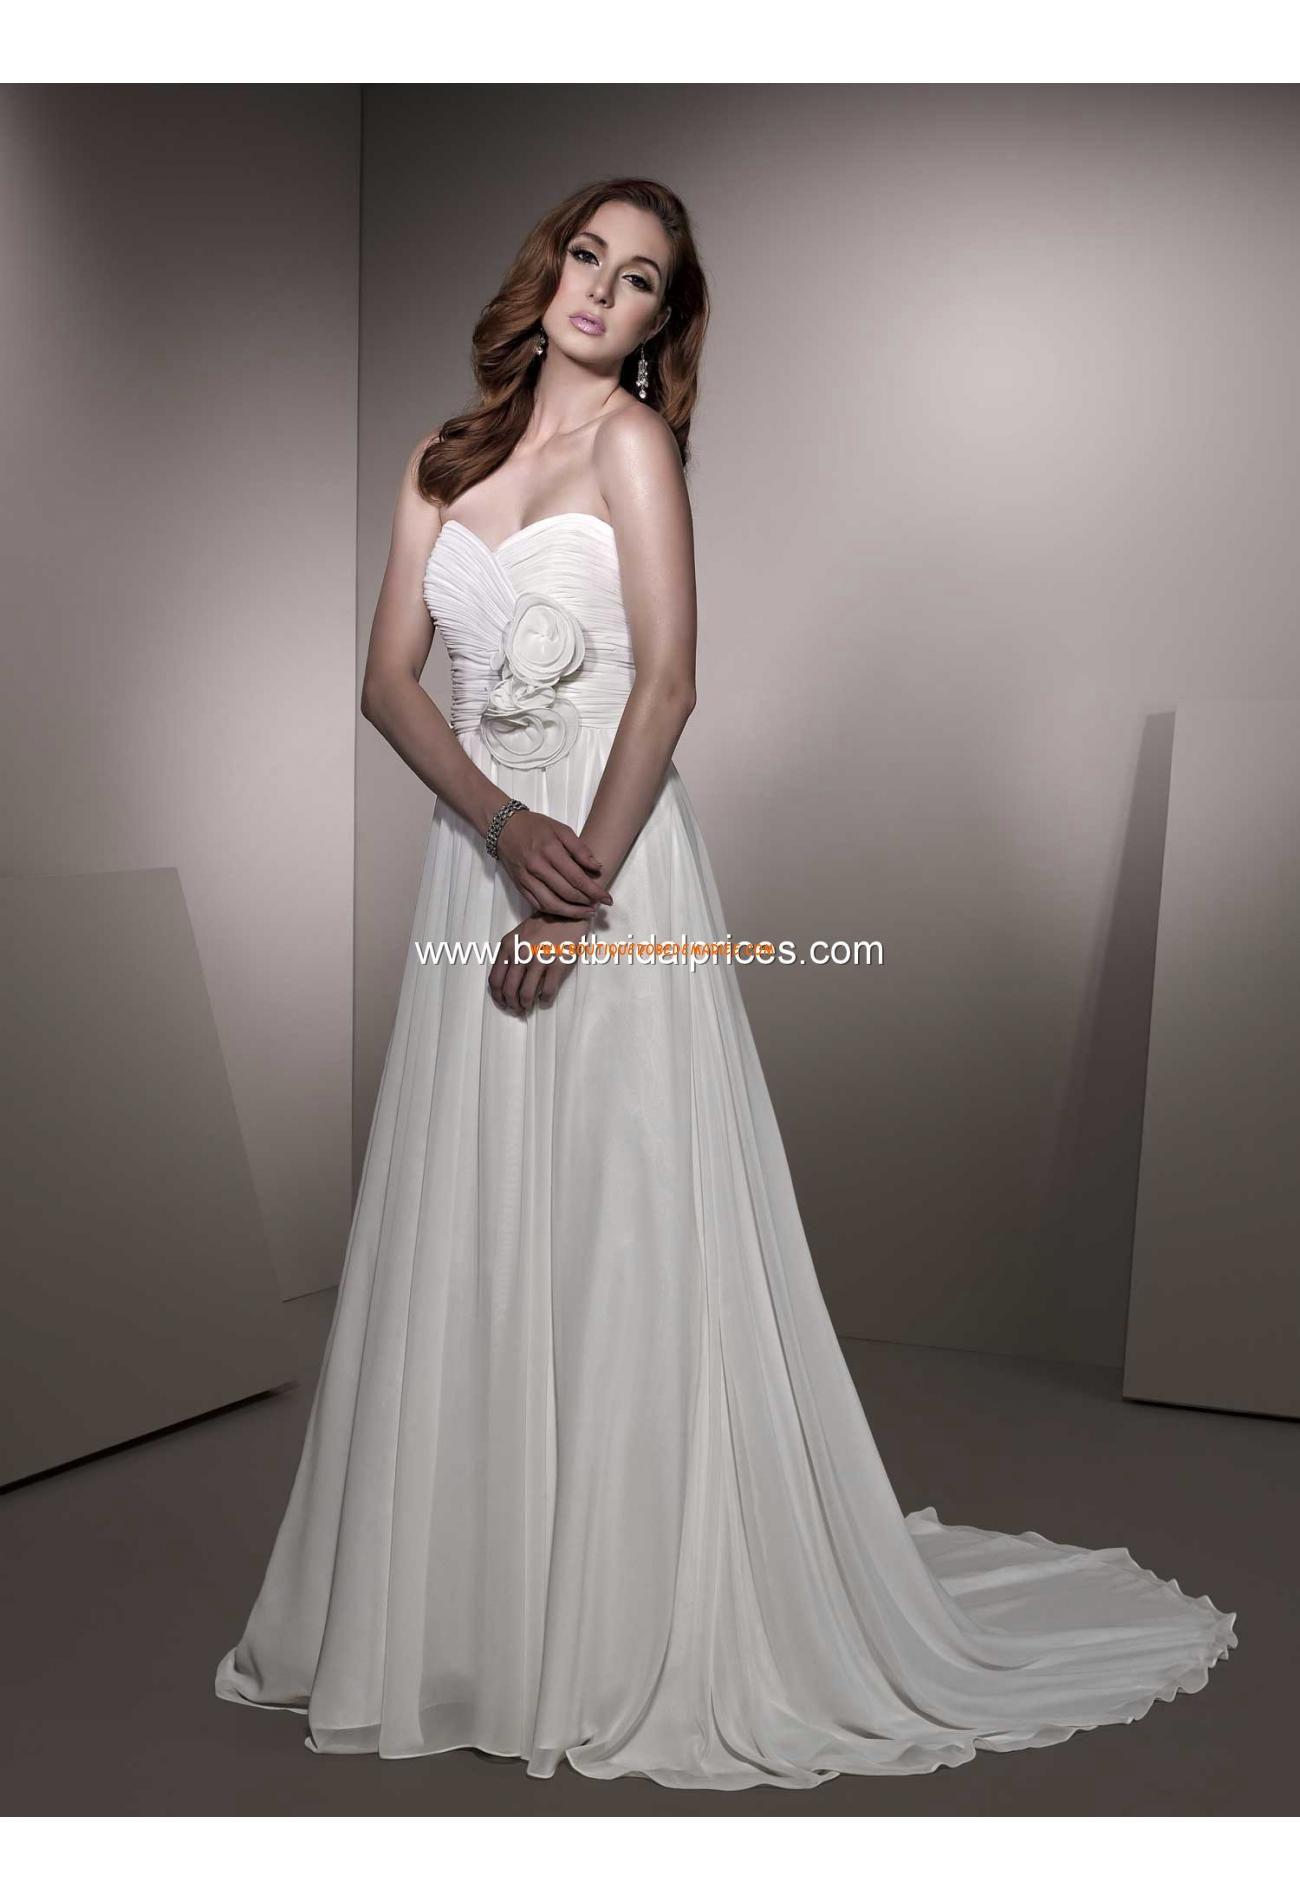 robe de mari e simple mousseline drap fleur robe de mari e grande taille pinterest. Black Bedroom Furniture Sets. Home Design Ideas